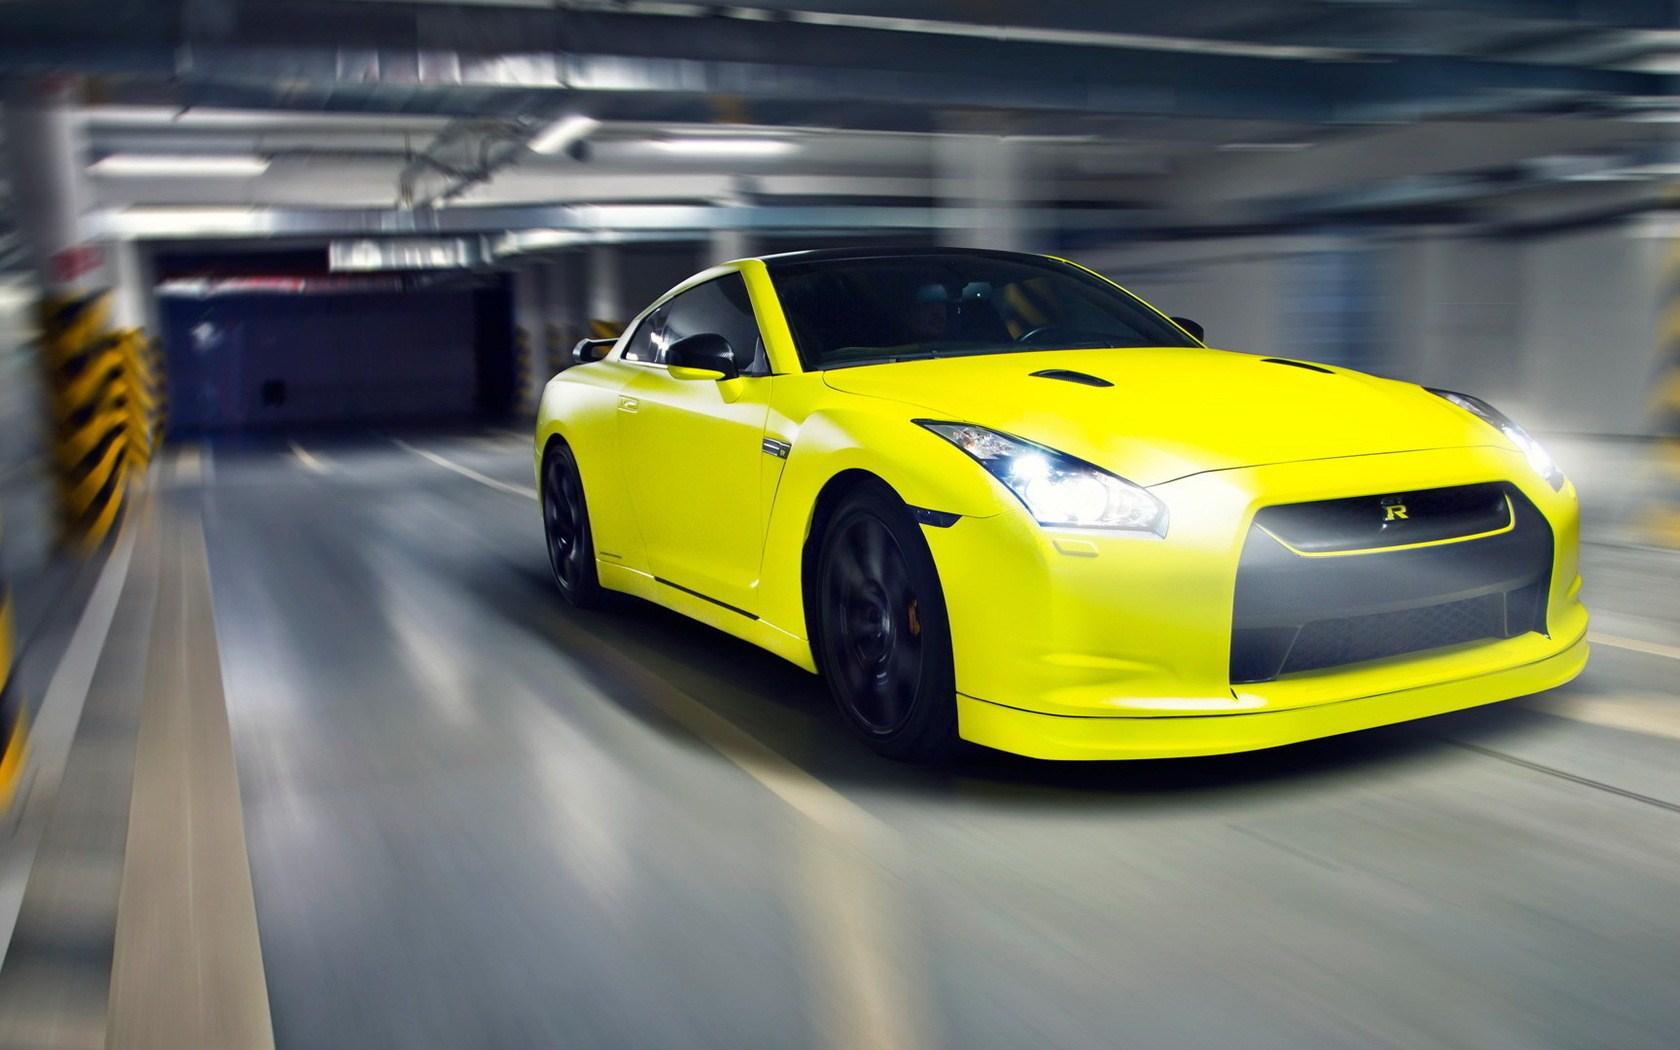 Yellow GTR wallpaper 1680x1050 25926 1680x1050